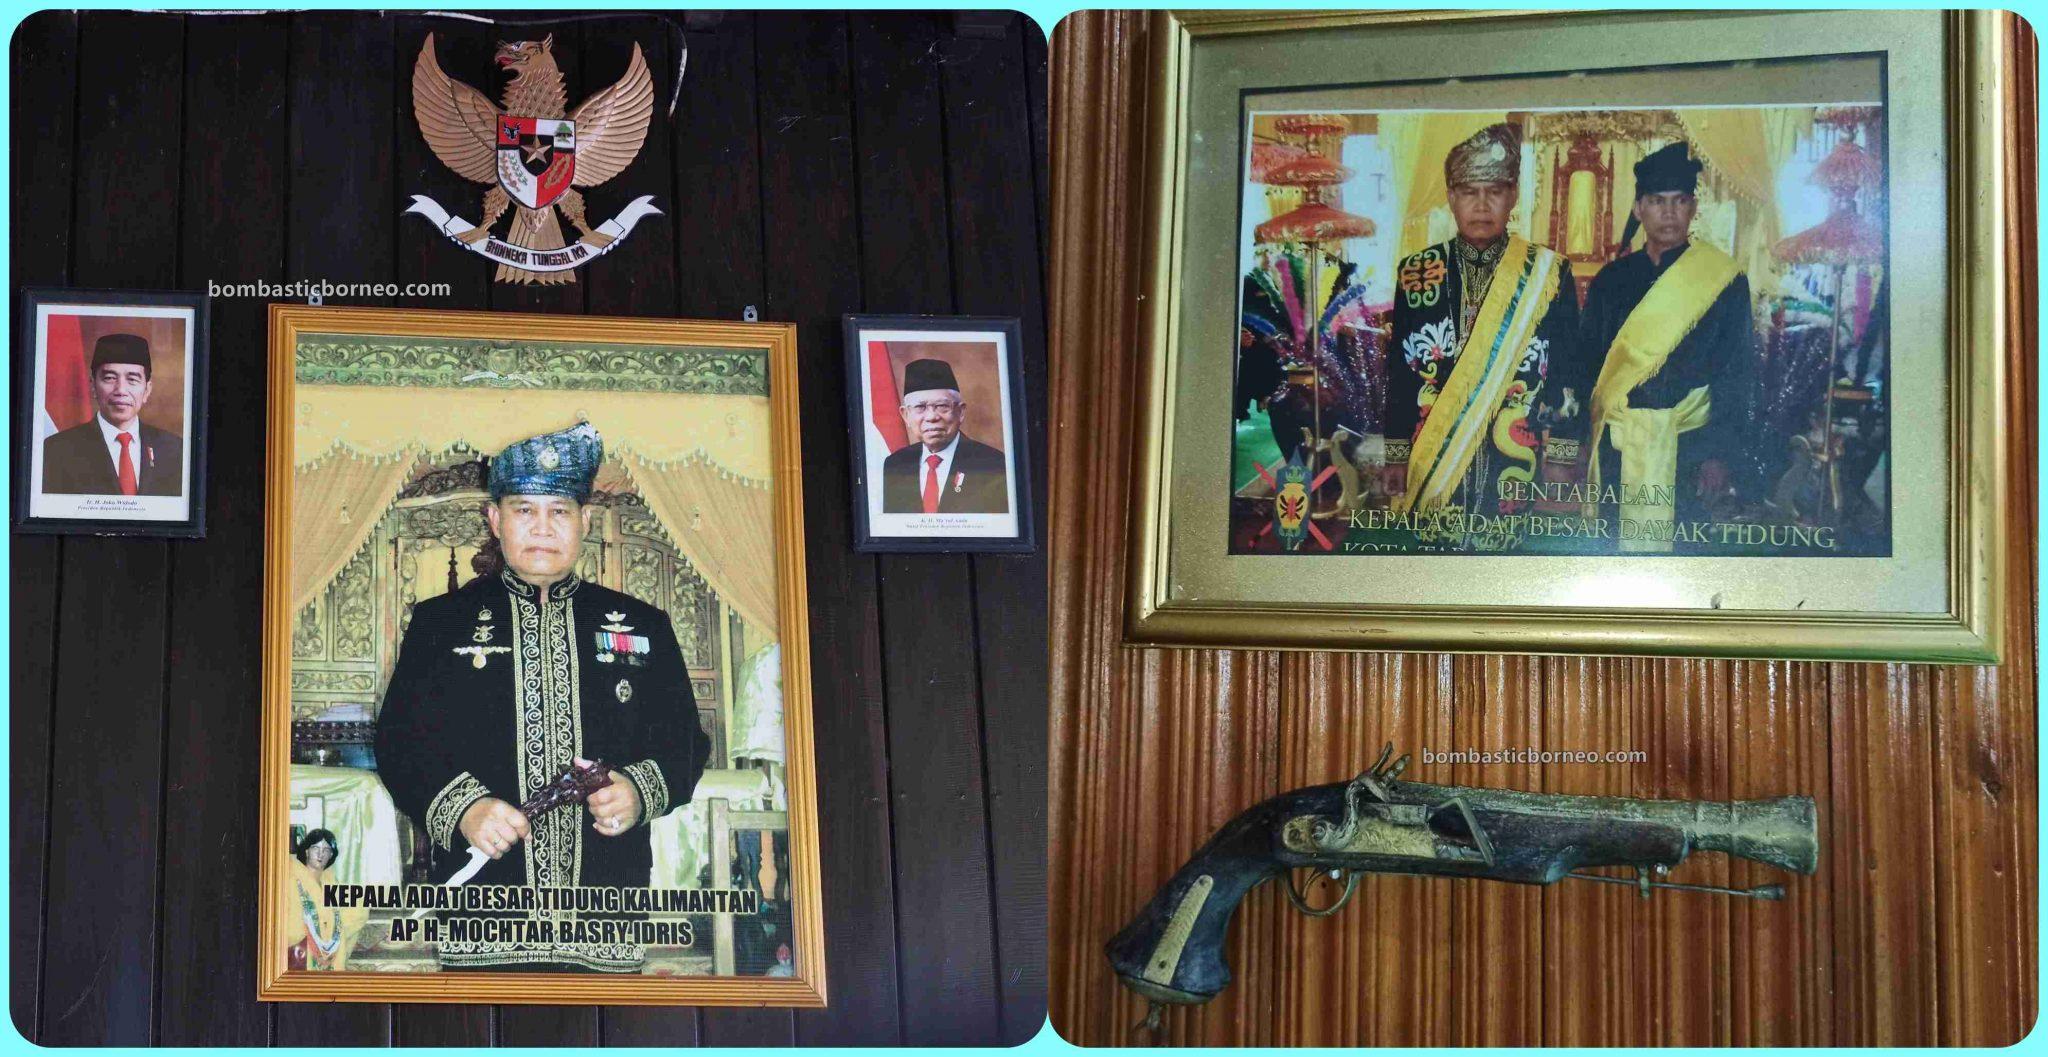 Rumah Baloy Mayo, Cultural Centre, museum, native, tribe, exploration, Destination, Kalimantan Utara, Kaltara, Pariwisata, tourist attraction, Borneo, 跨境婆罗洲游踪, 印尼北加里曼丹, 打拉根岛旅游景点